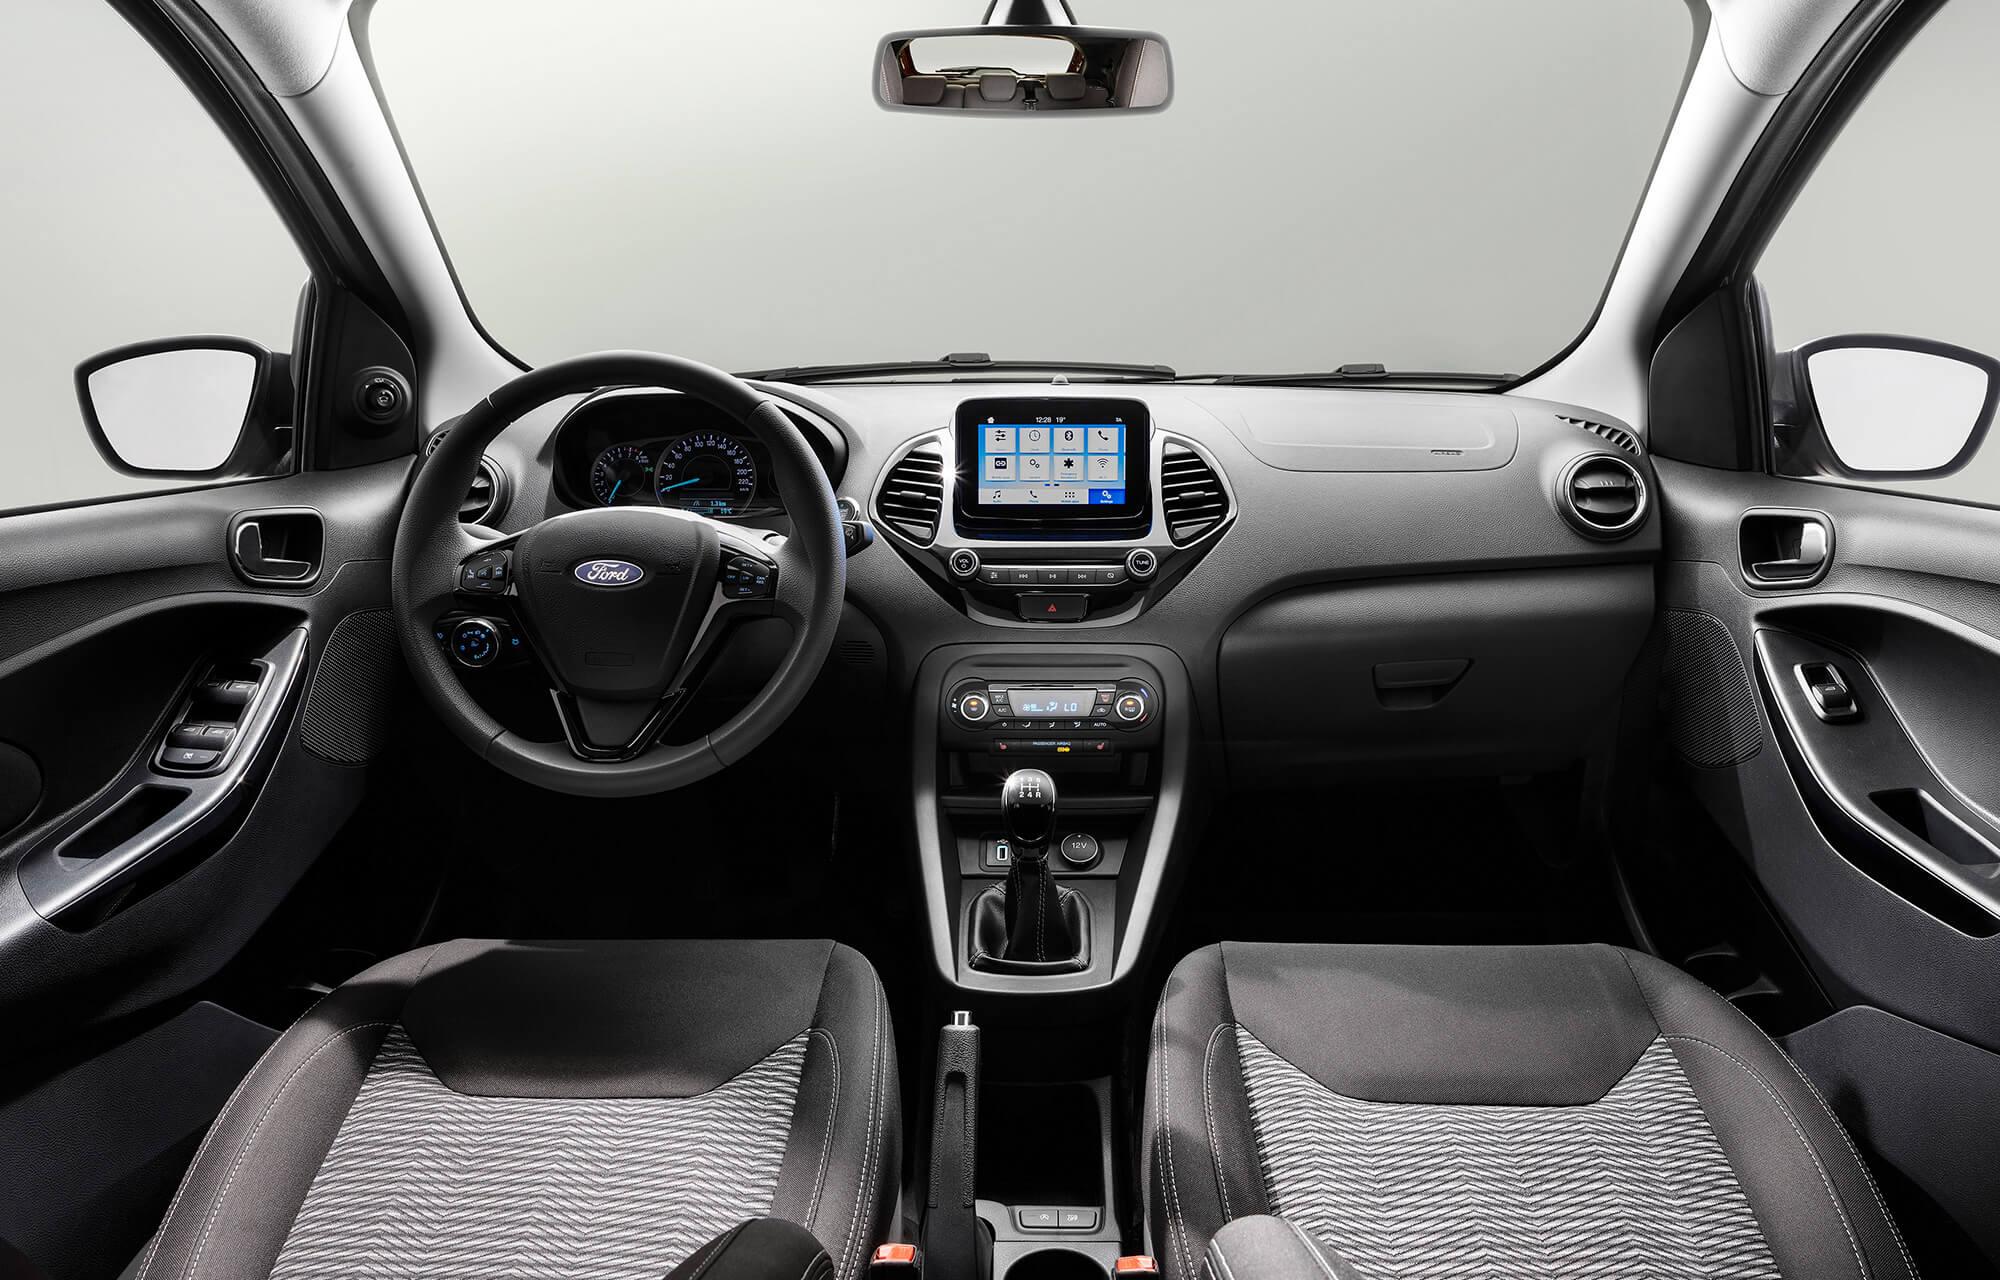 Interieur van de nieuwe Ford KA+